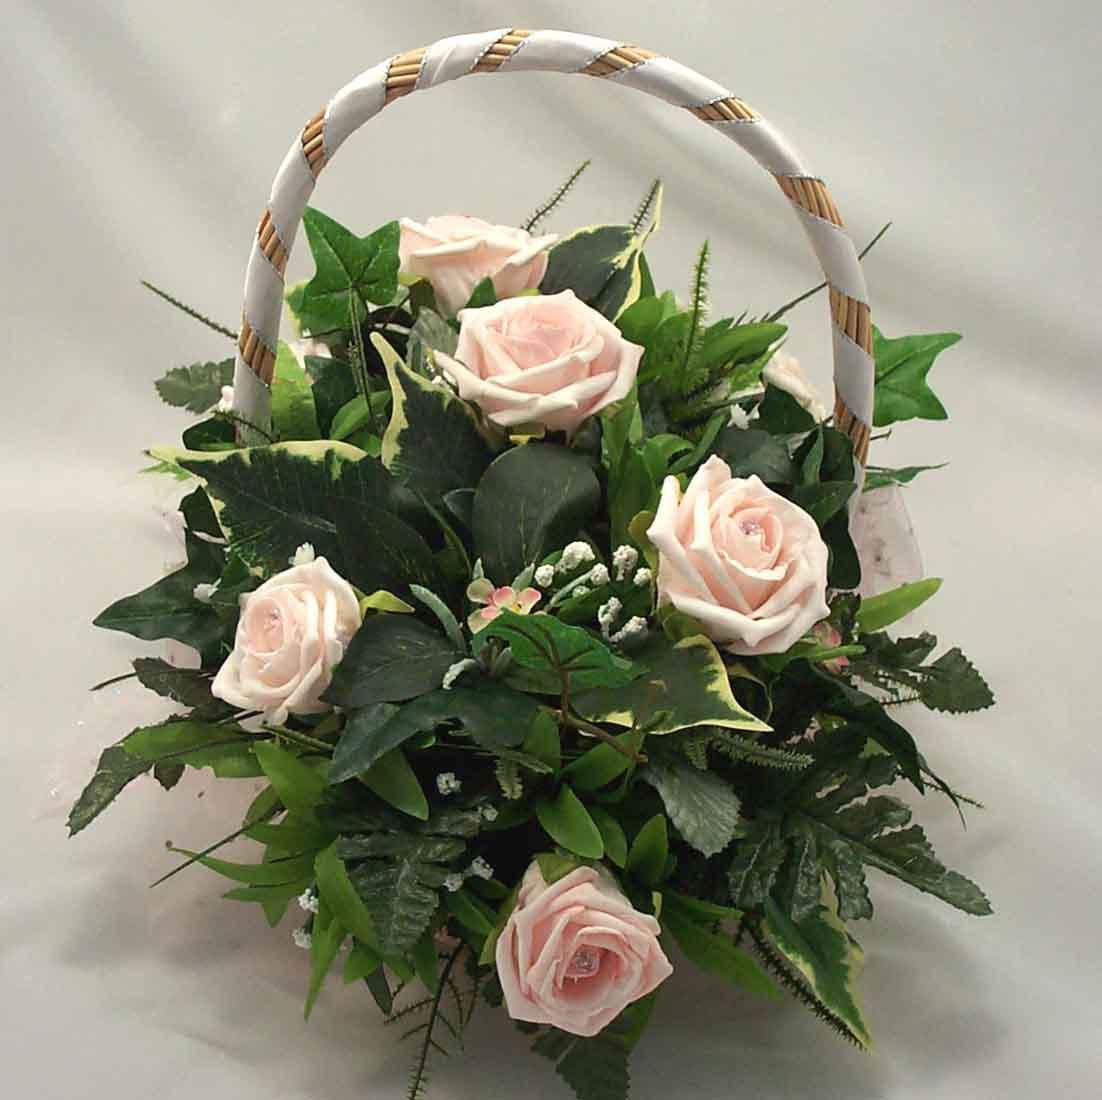 wedding hair accessories, wedding cakes, wedding dresses ring pillow, wedding accessories-88